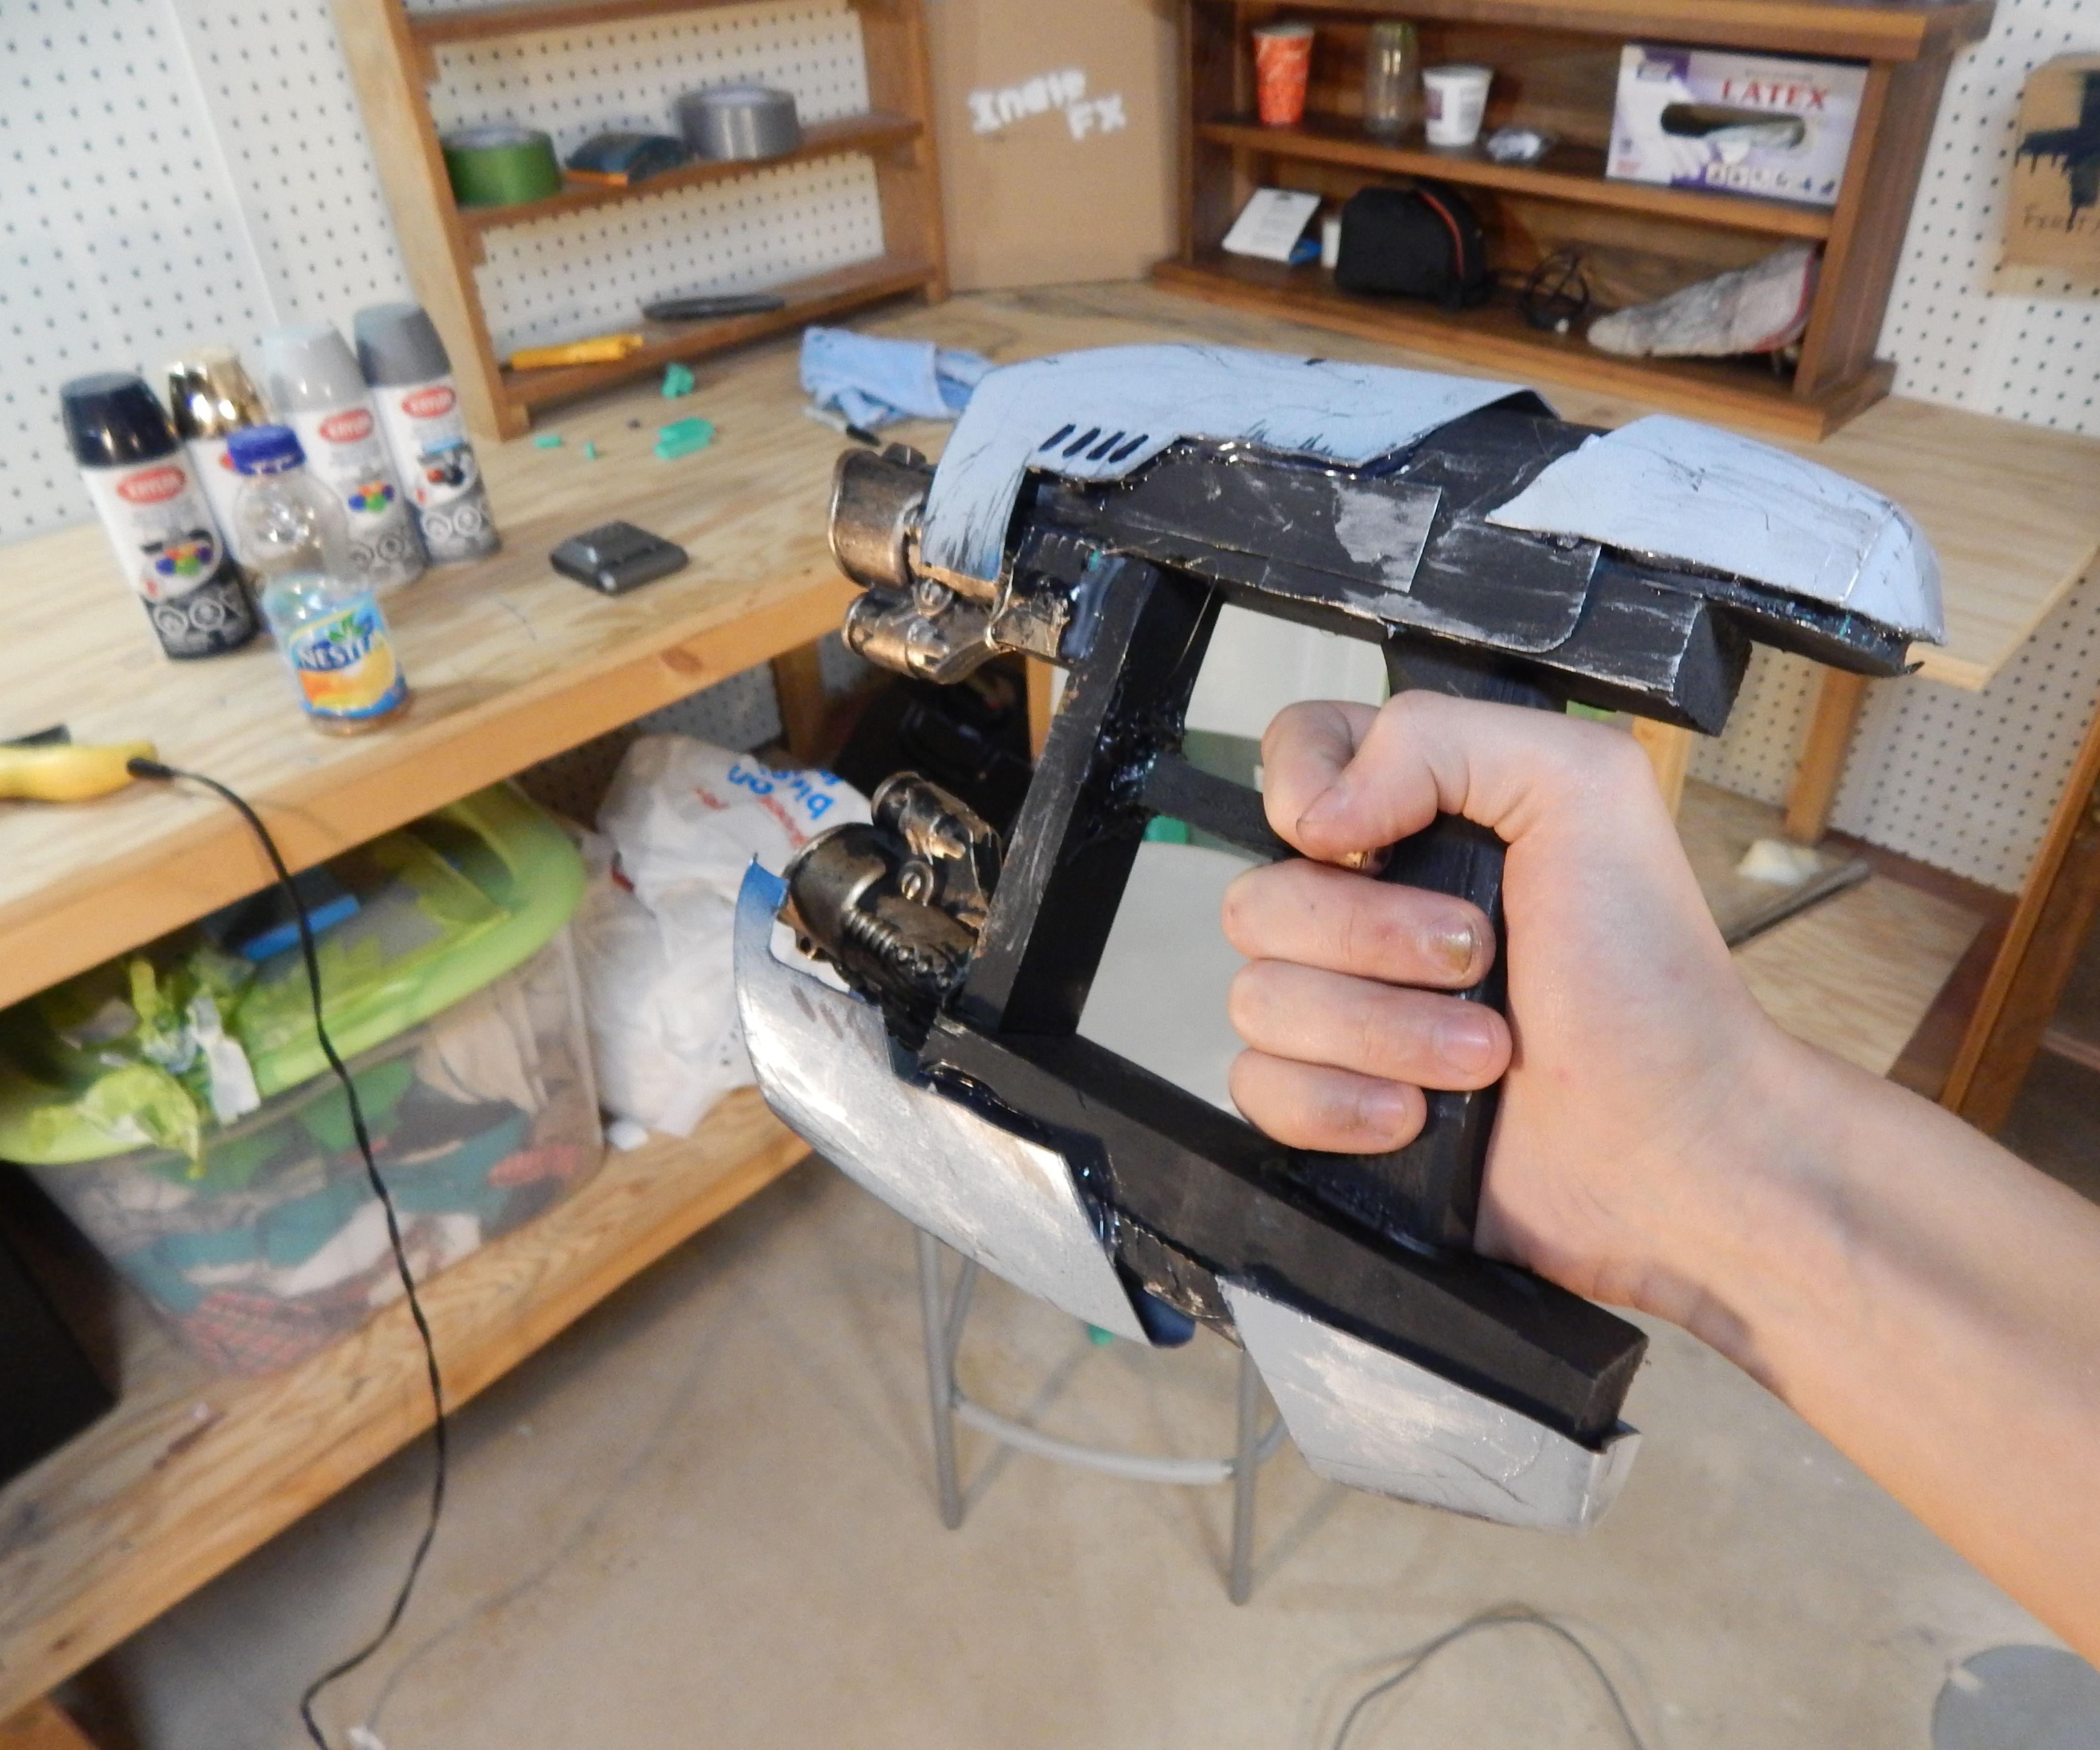 Guardians Of The Galaxy Sci-Fi Blasters : DIY Tutorial : IFX